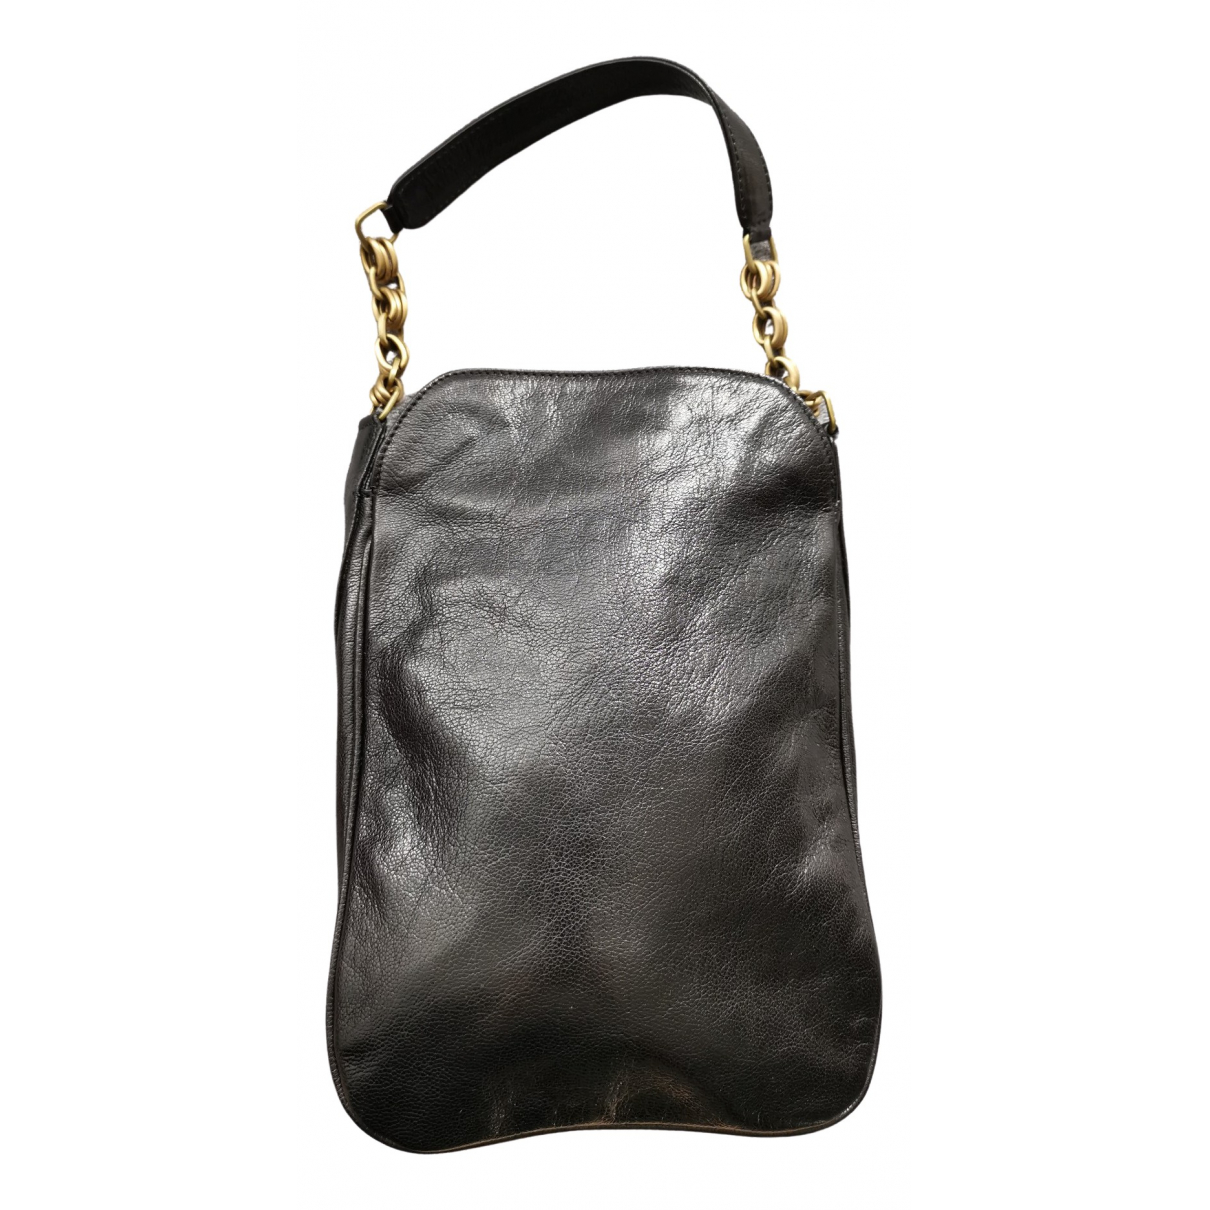 Nina Ricci - Sac a main   pour femme en cuir - noir